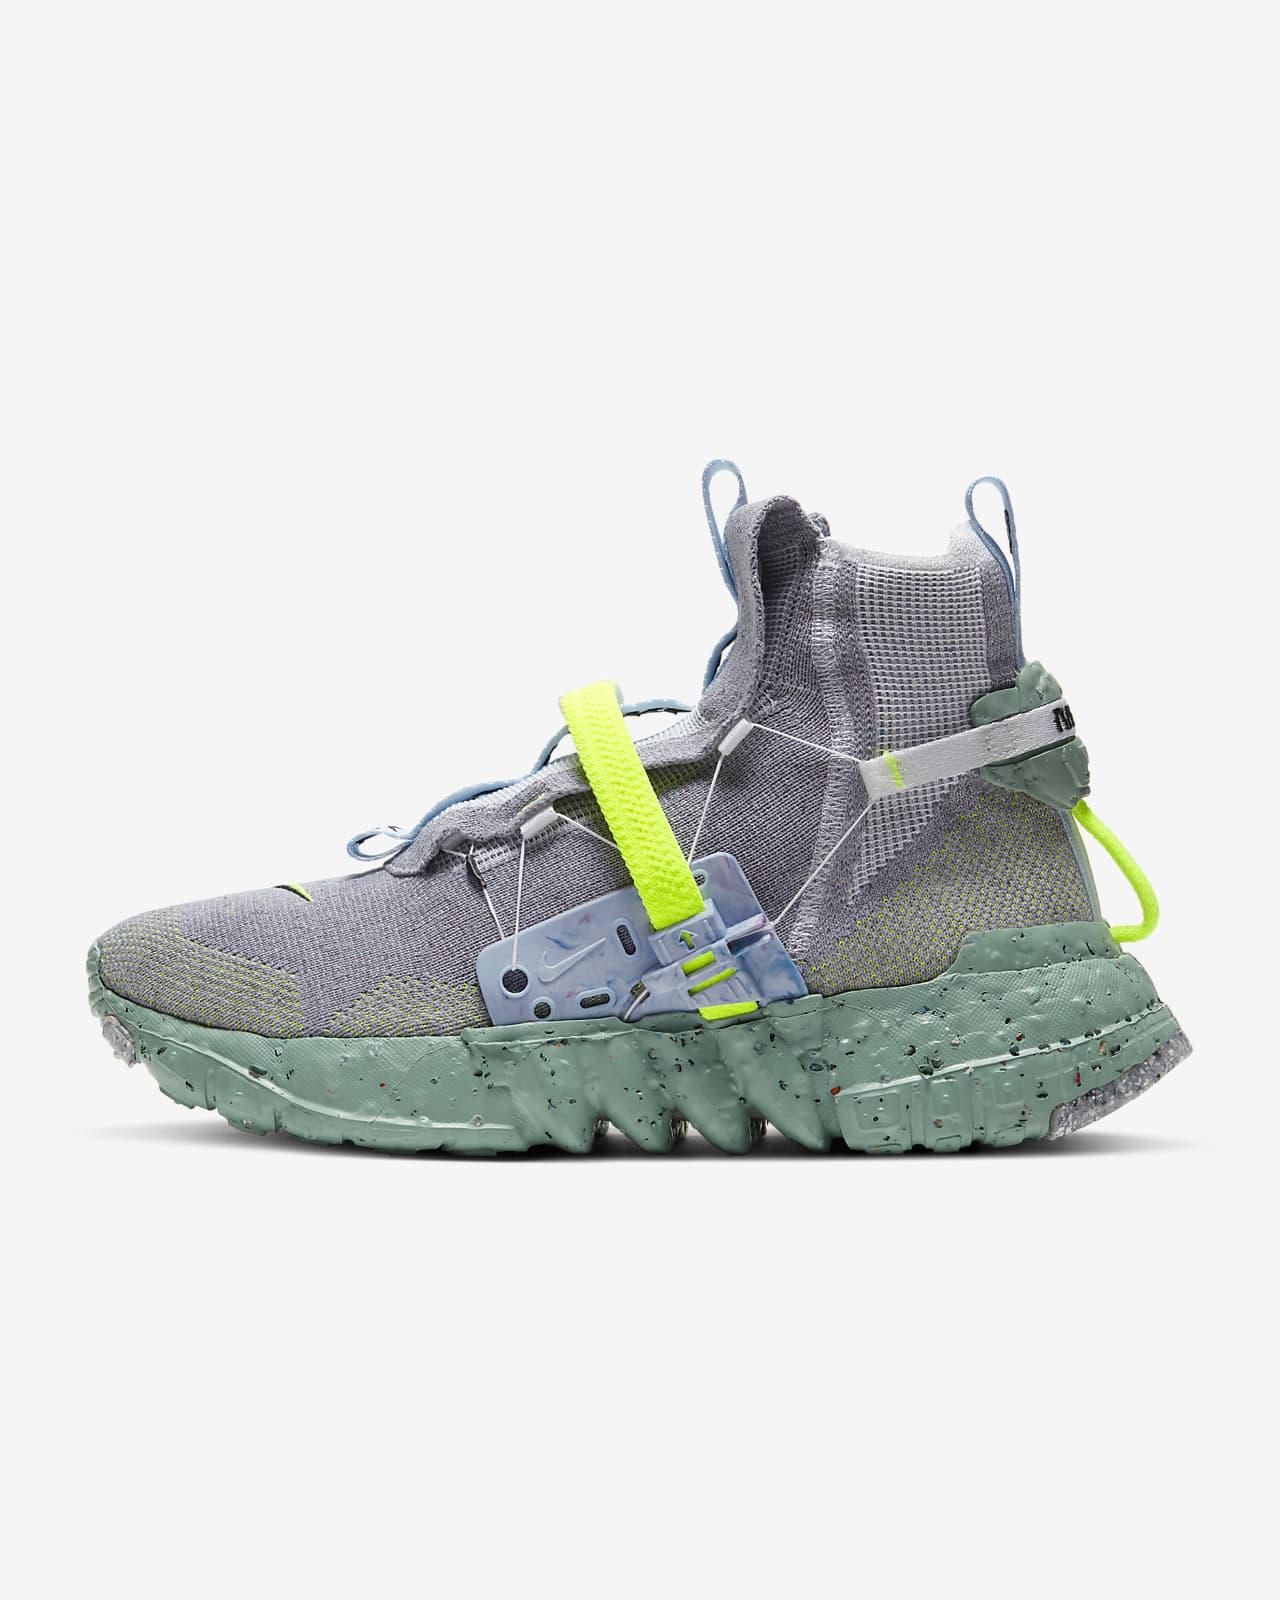 Nike Space Hippie 03 Shoe